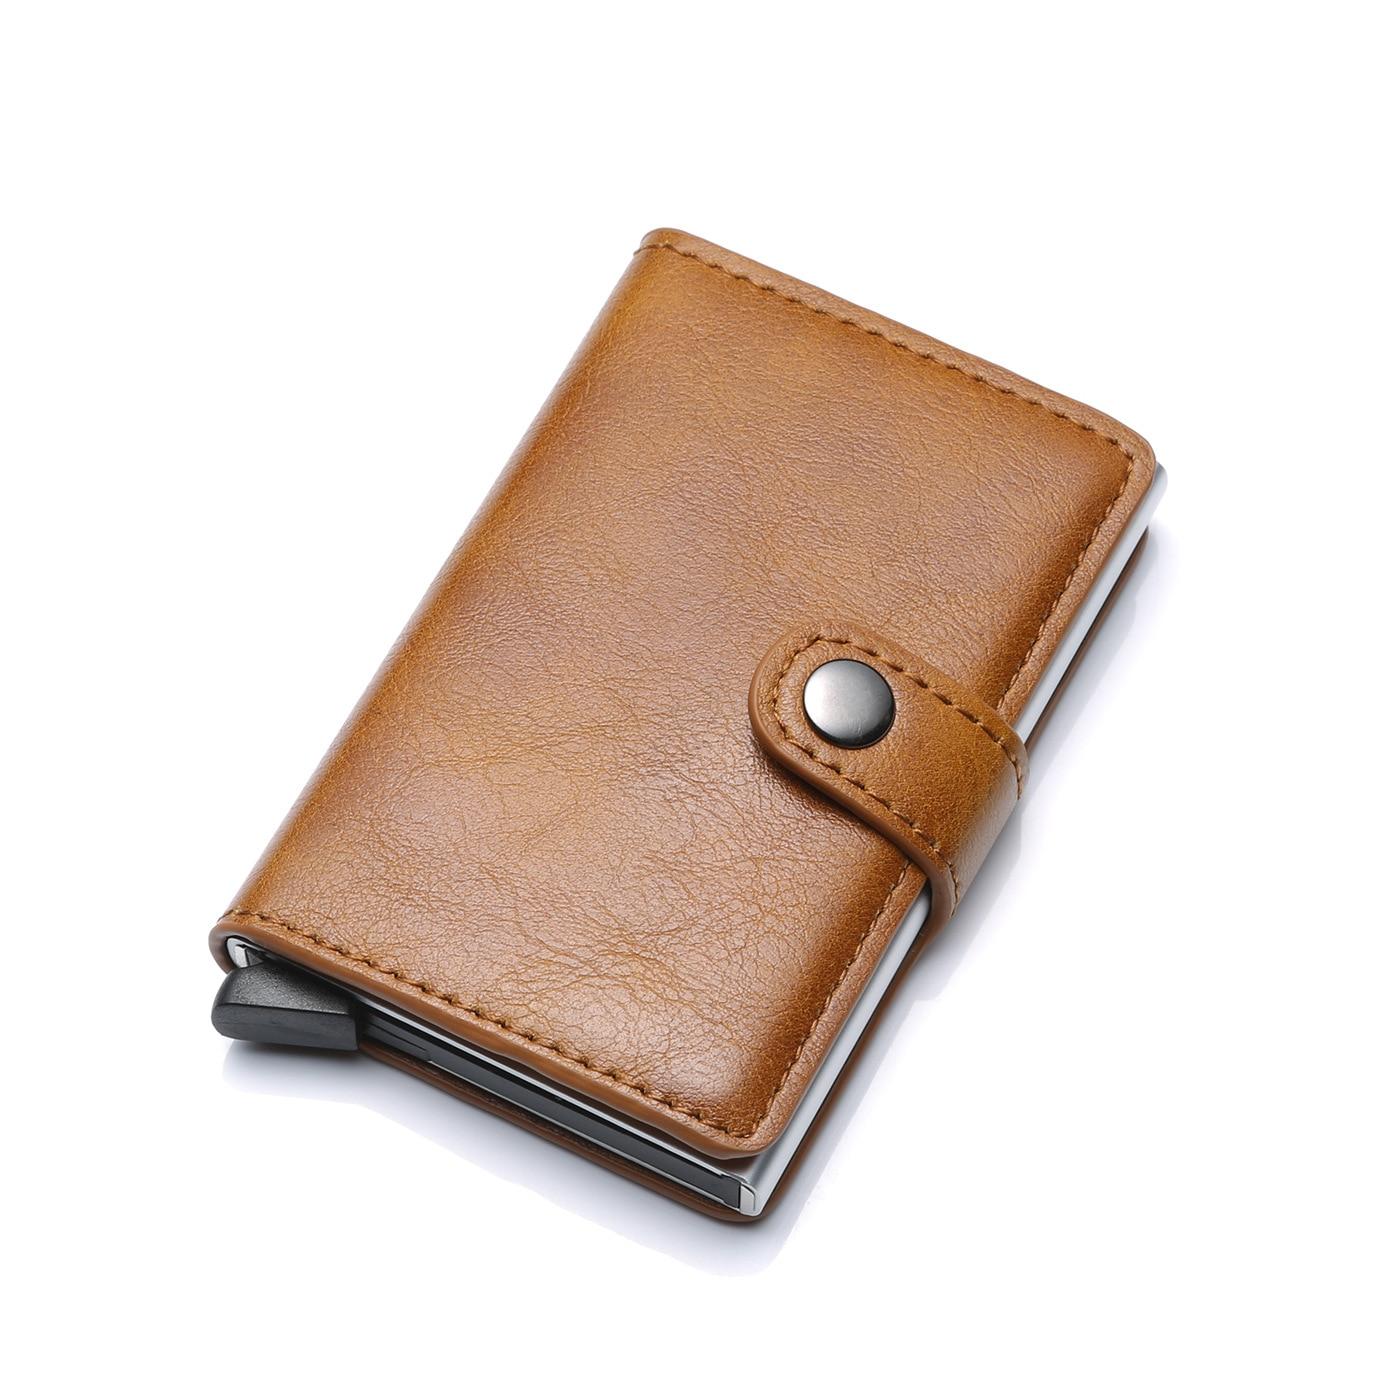 2019 New Automatic Credit Card Coin Purse Men Aluminum Wallet Back Pocket ID Card Holder RFID Blocking Mini Magic Wallet